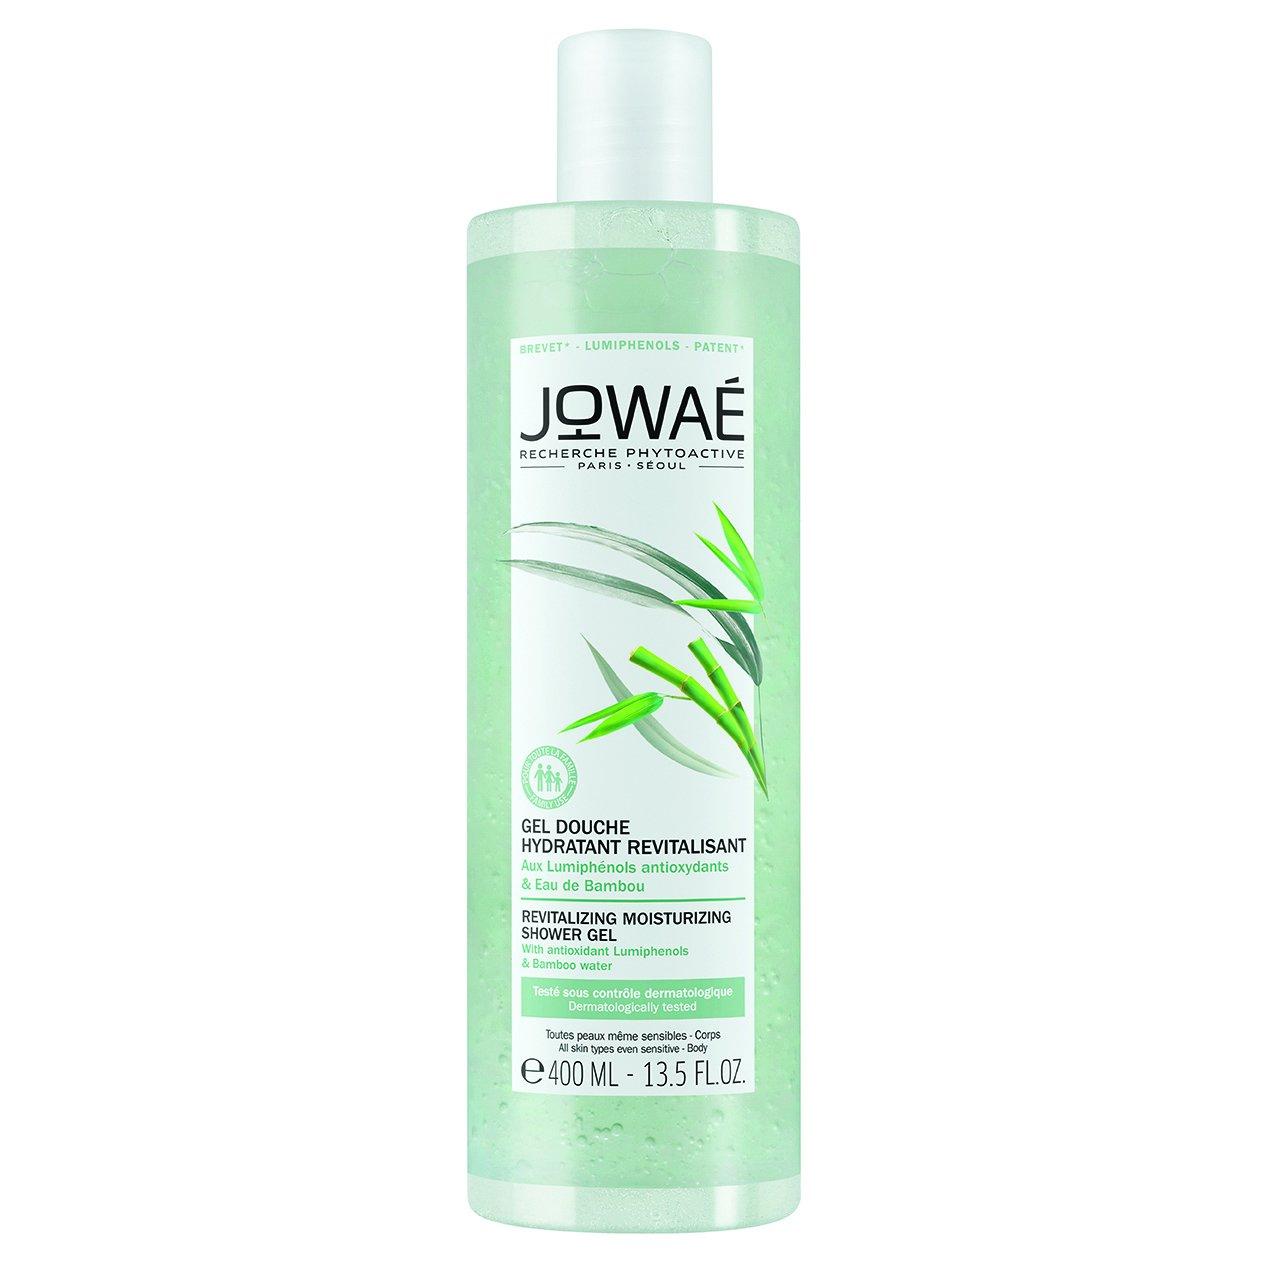 Jowae Revitalizing Moisturizing Shower Gel Αναζωογονητικό Αφρόλουτρο με Αντιοξειδωτικές Φωτοφαινόλες & Νερό από Μπαμπού 400ml